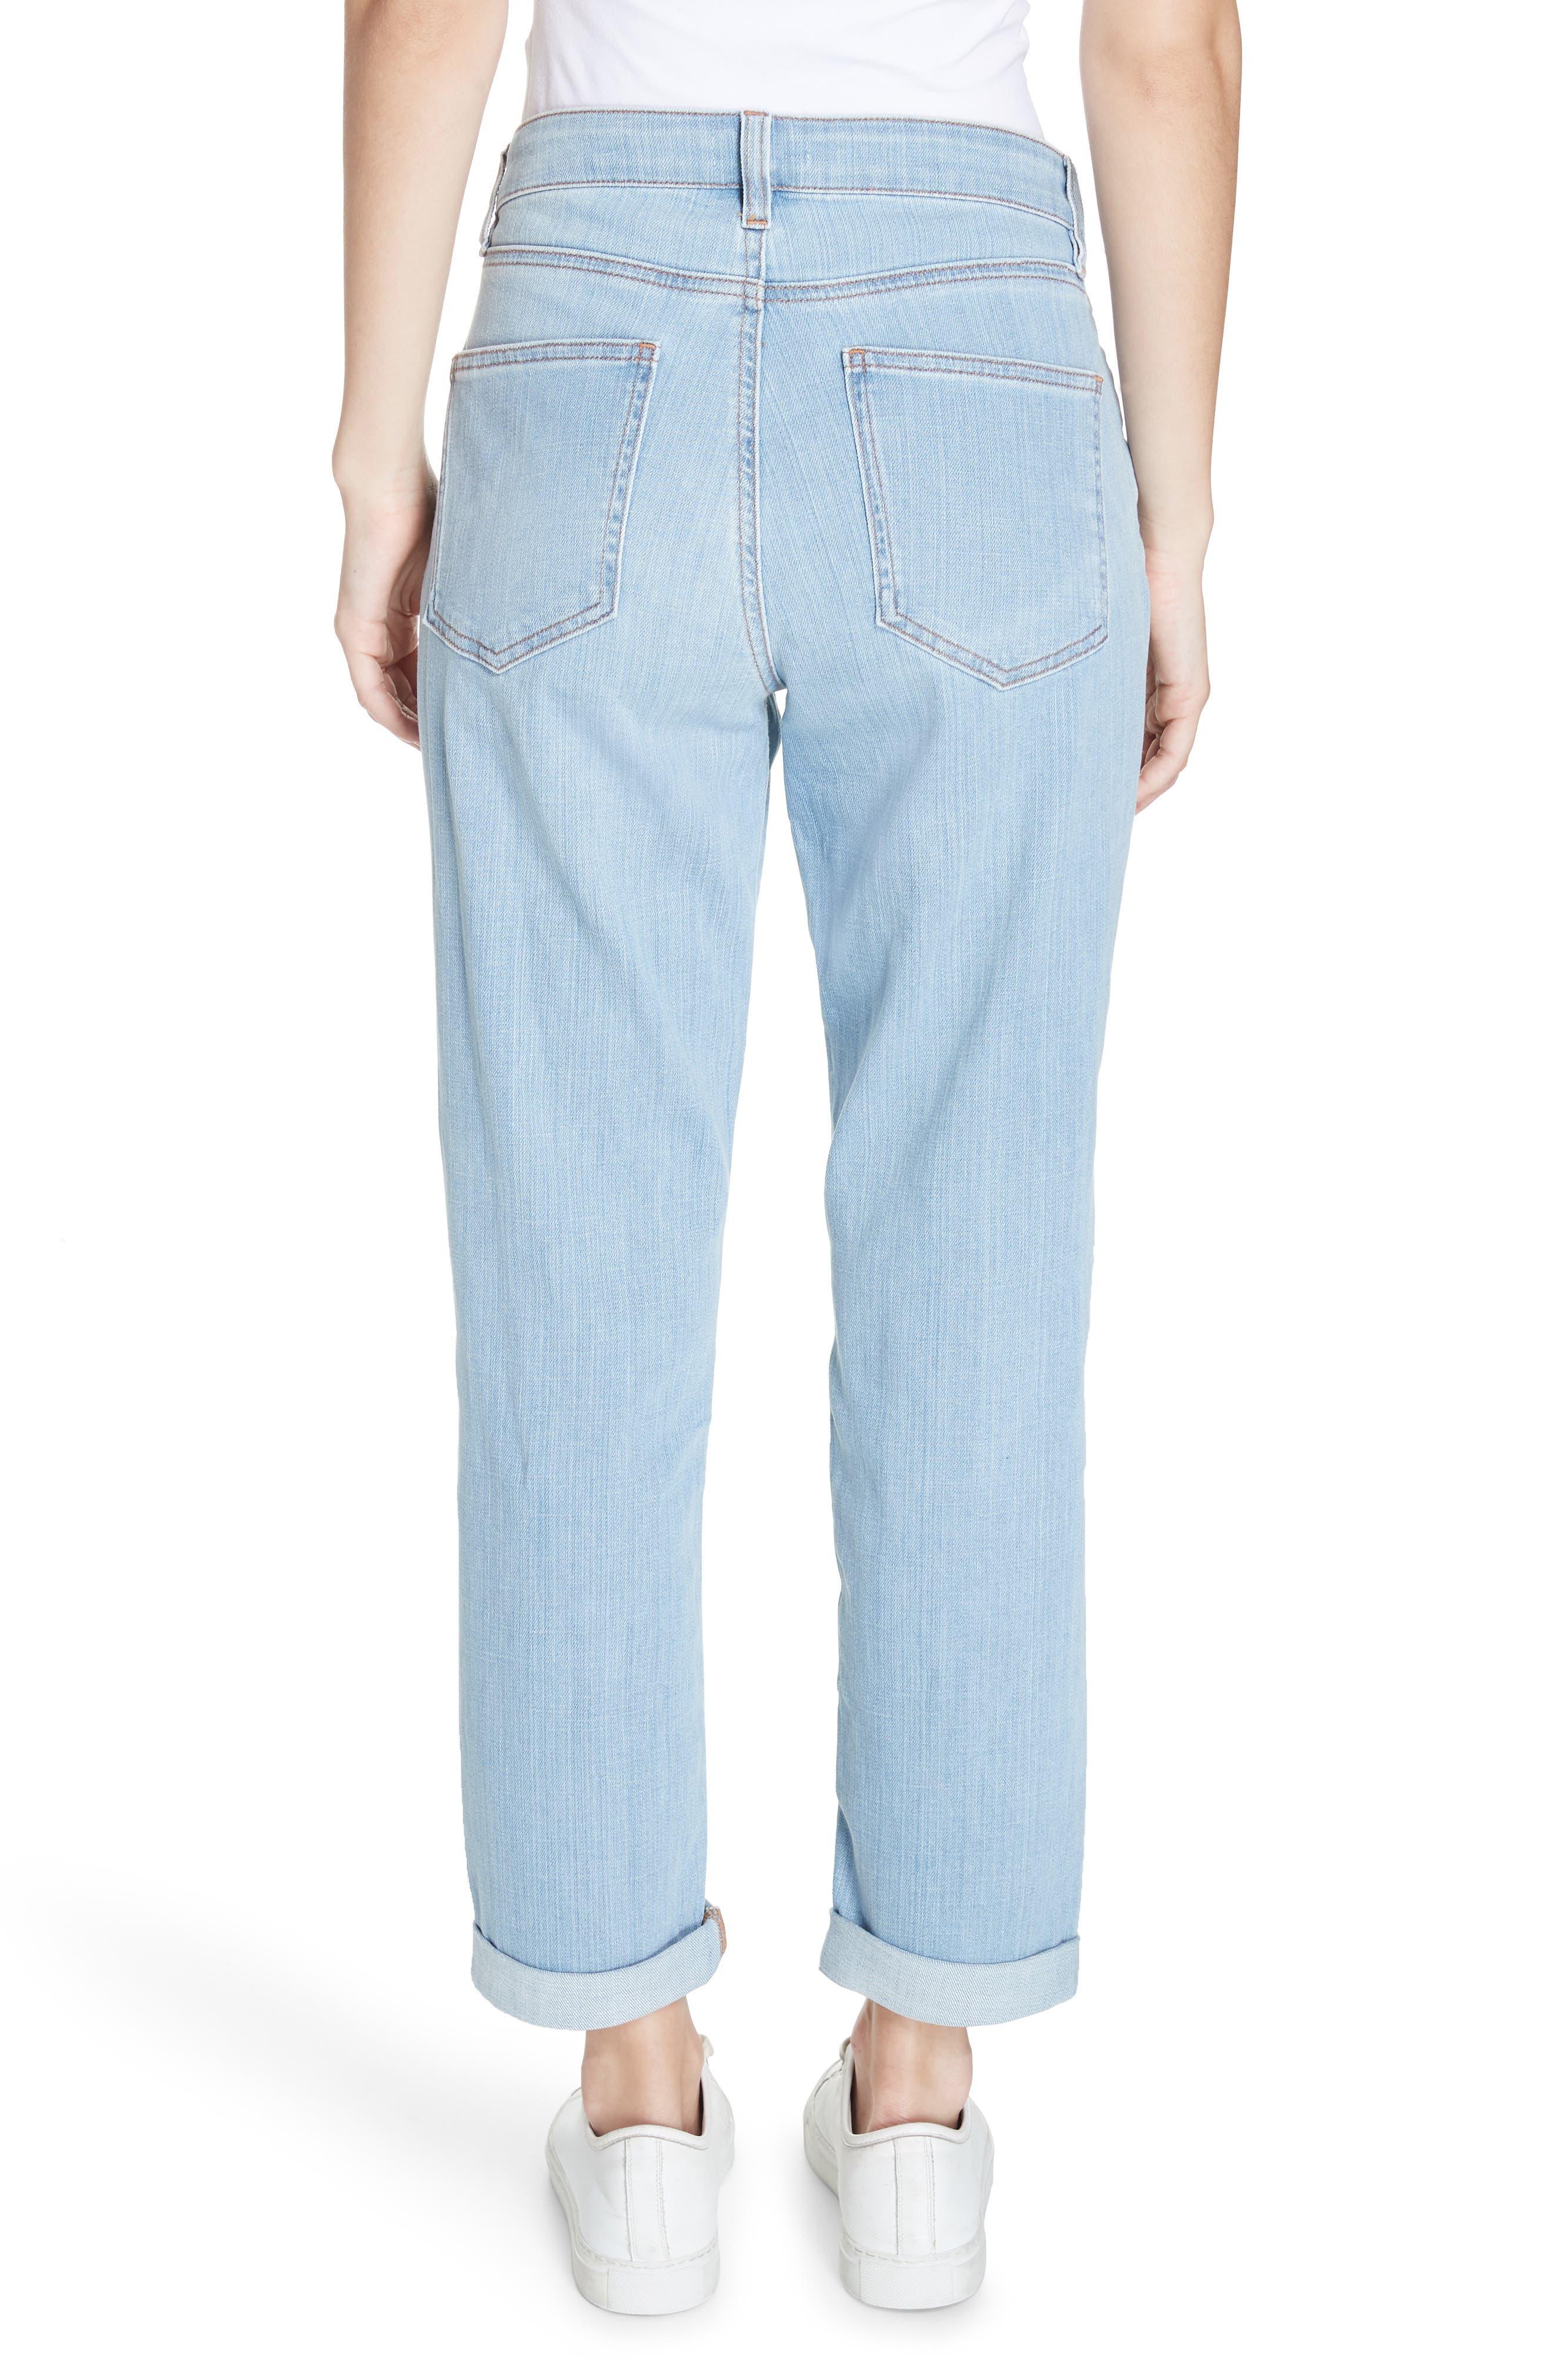 EILEEN FISHER, Organic Cotton Boyfriend Jeans, Alternate thumbnail 2, color, ICE BLUE